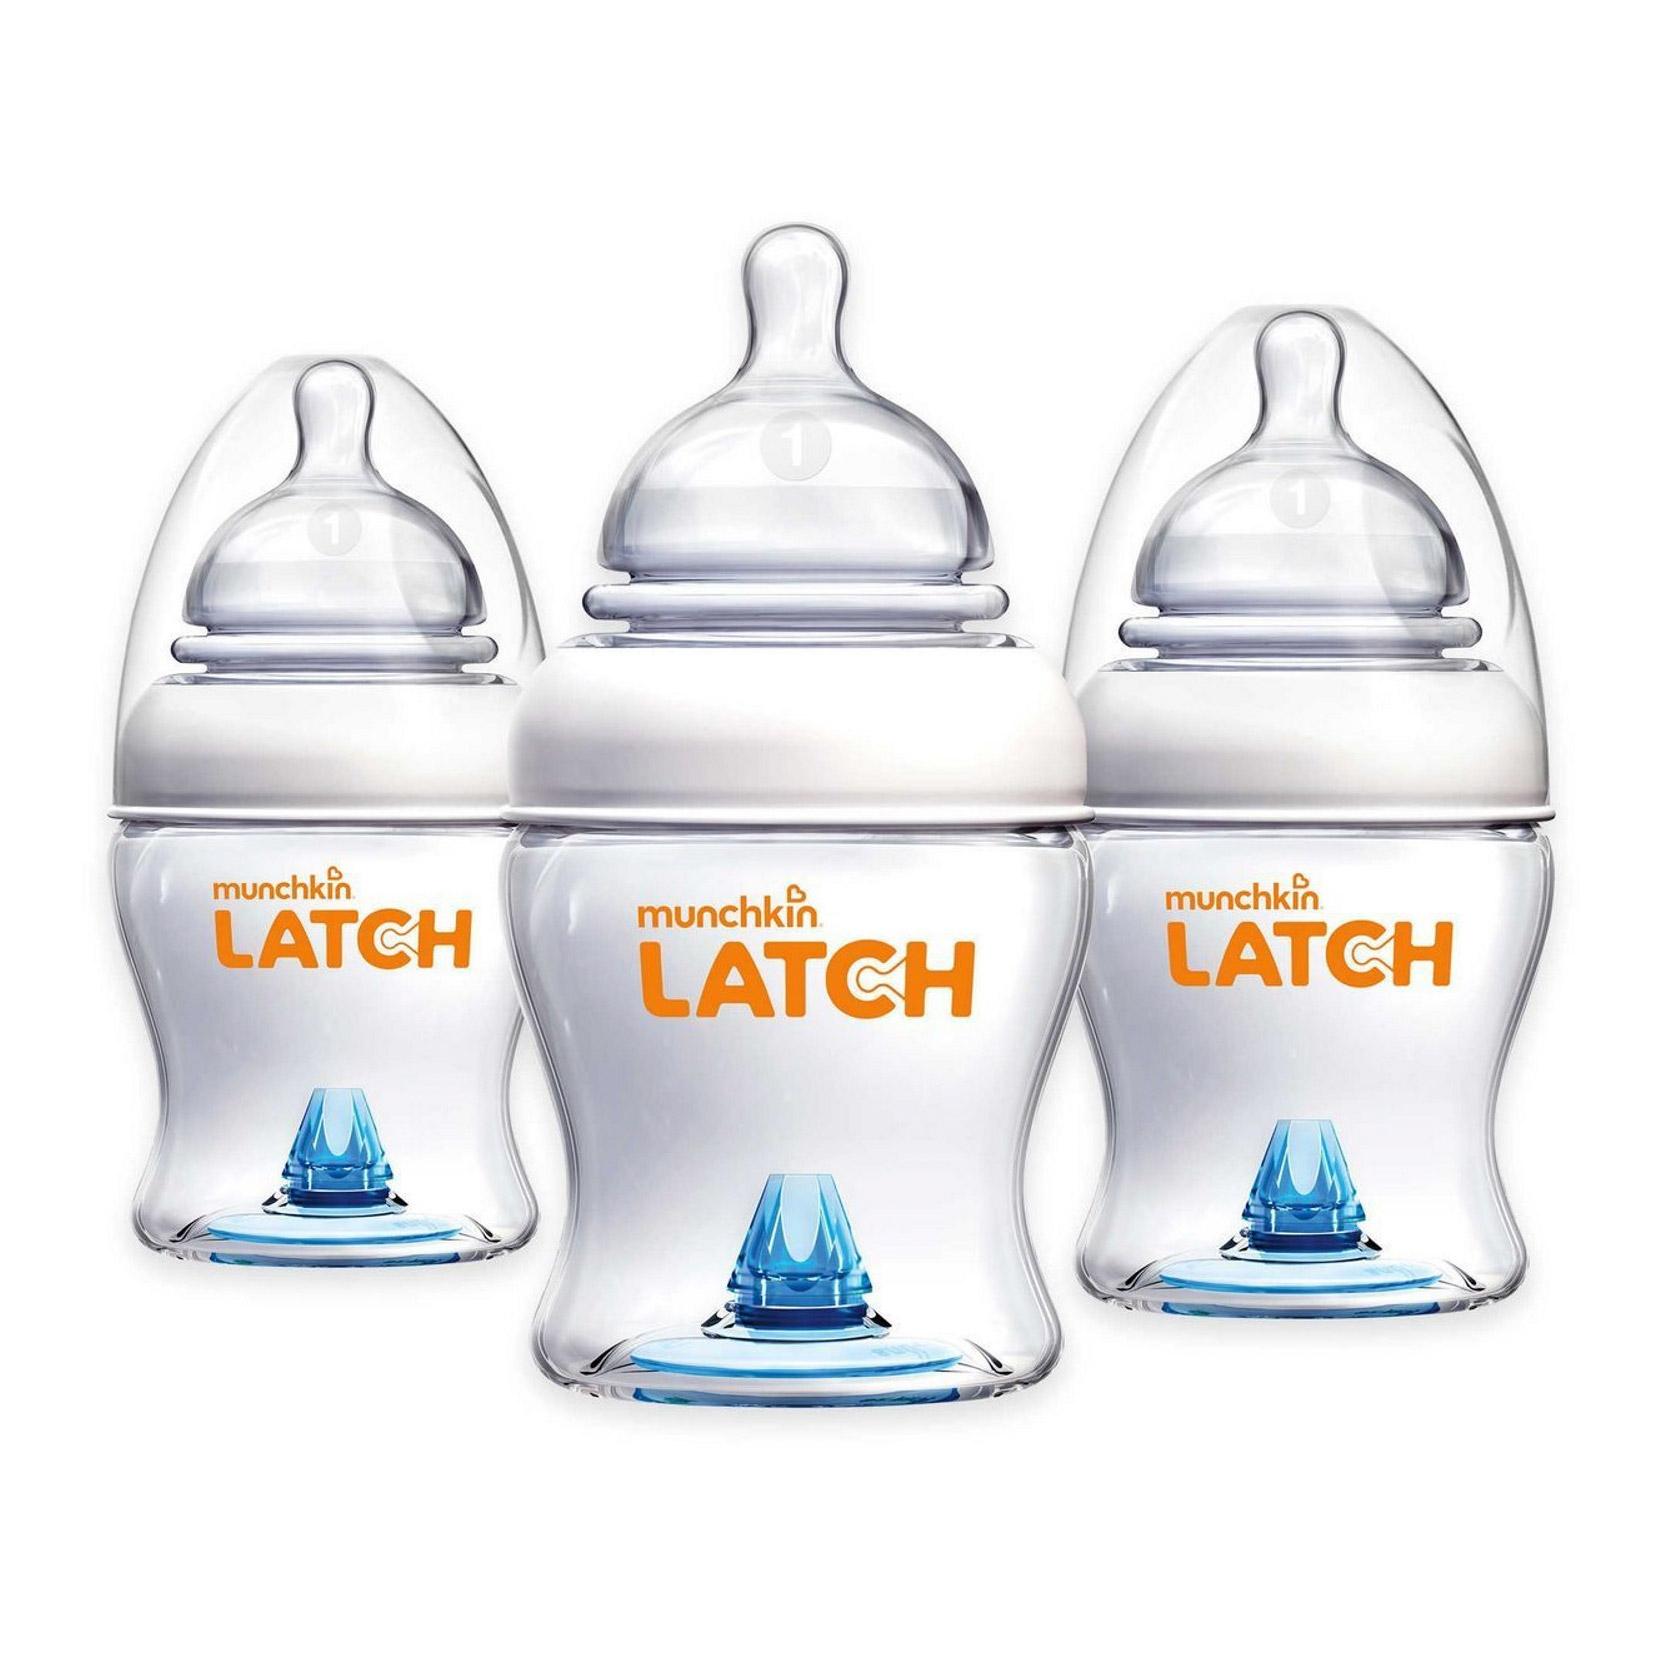 Бутылочка Munchkin Latch для кормления с 0 месяцев 120 мл 3 шт